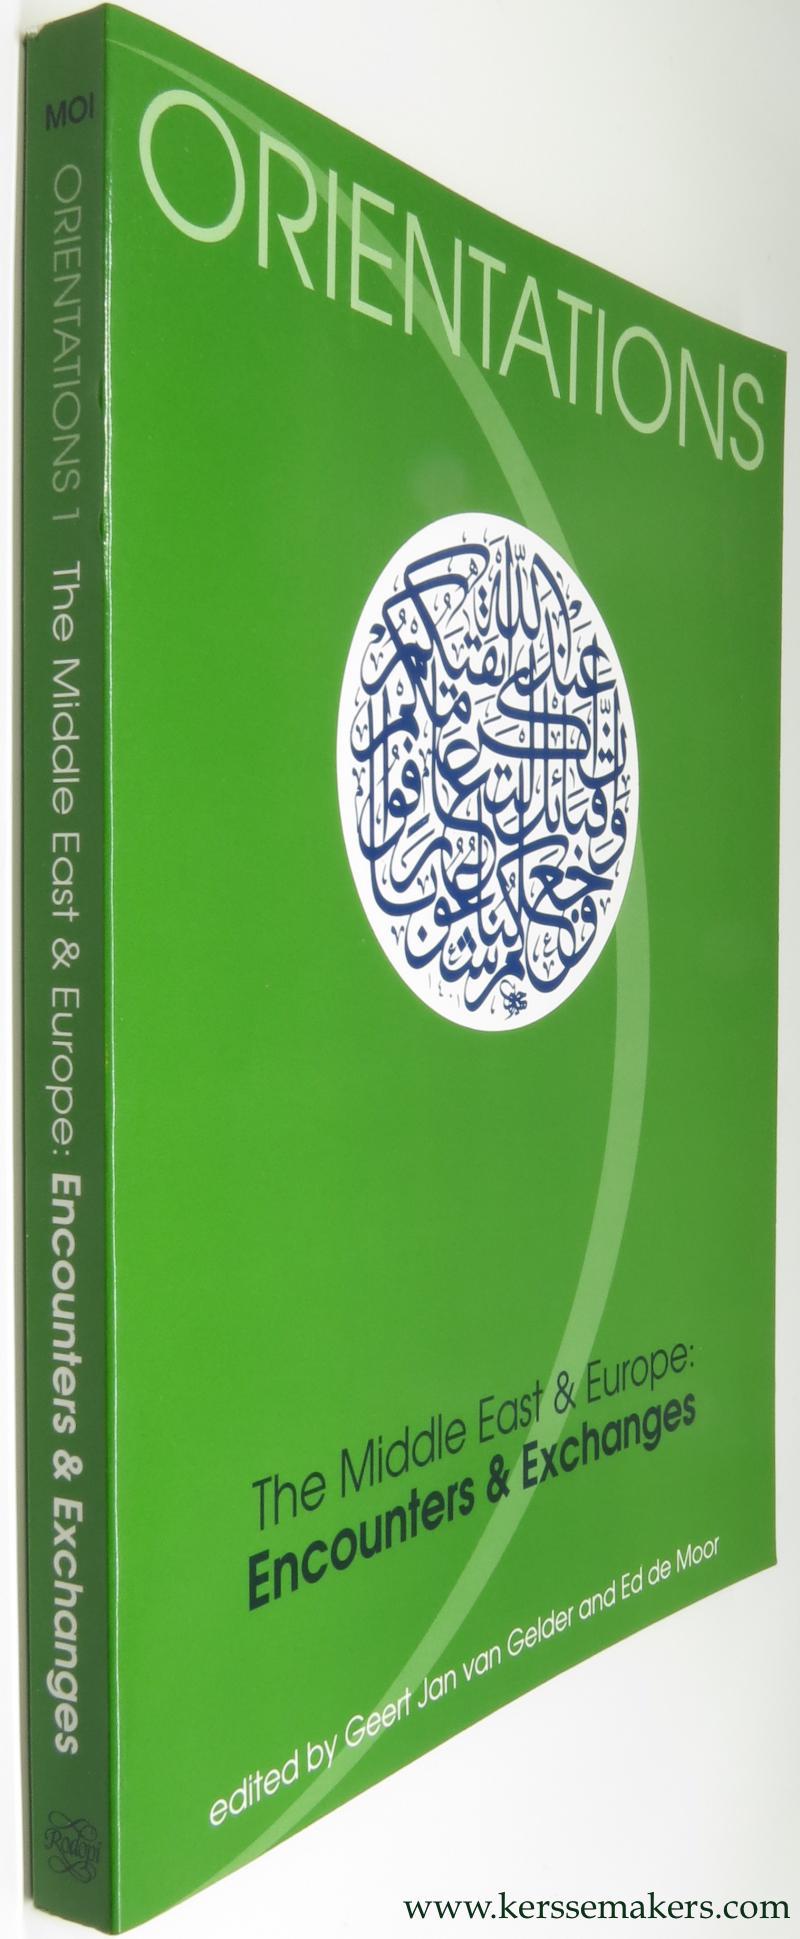 GELDER, G.J. VAN. & E. DE MOOR. (EDS.) - The Middle East and Europe. Encounters and exchanges